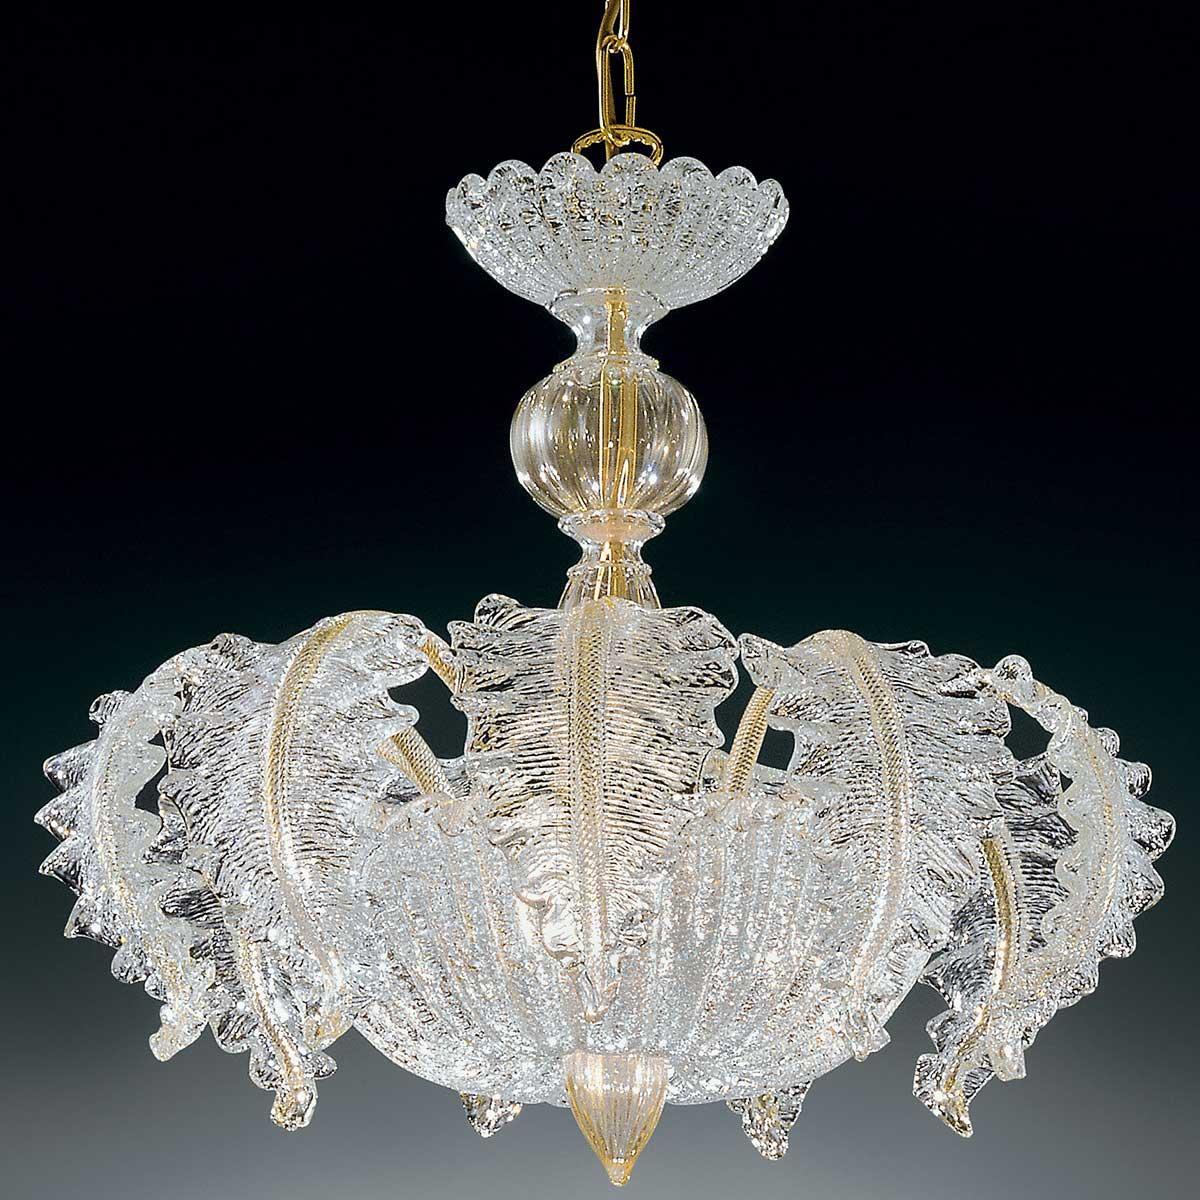 """Elise"" lampara de araña de Murano - 3 luces - transparente y oro"